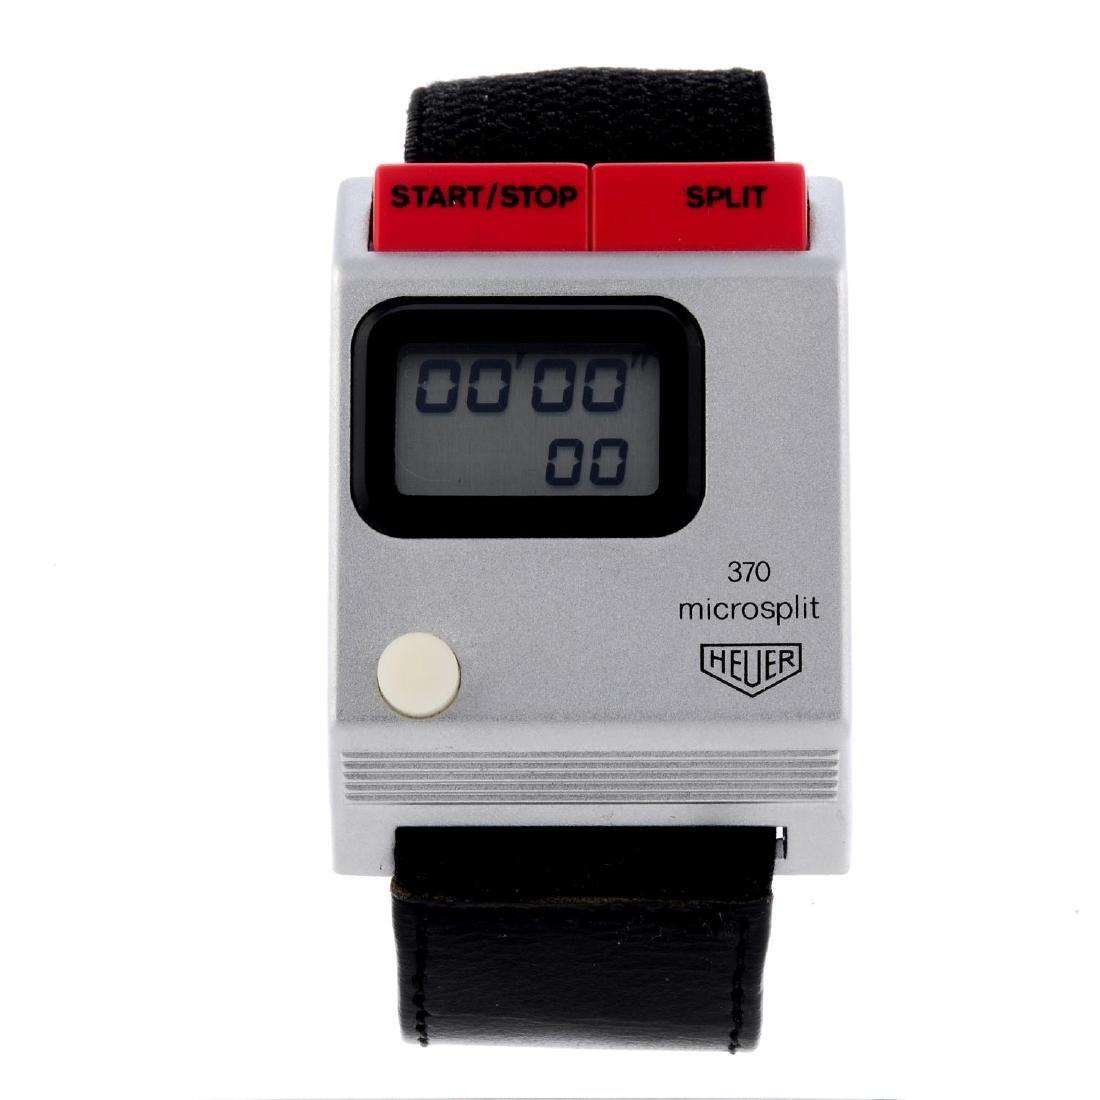 HEUER - a 370 Microsplit sports timer wrist watch.